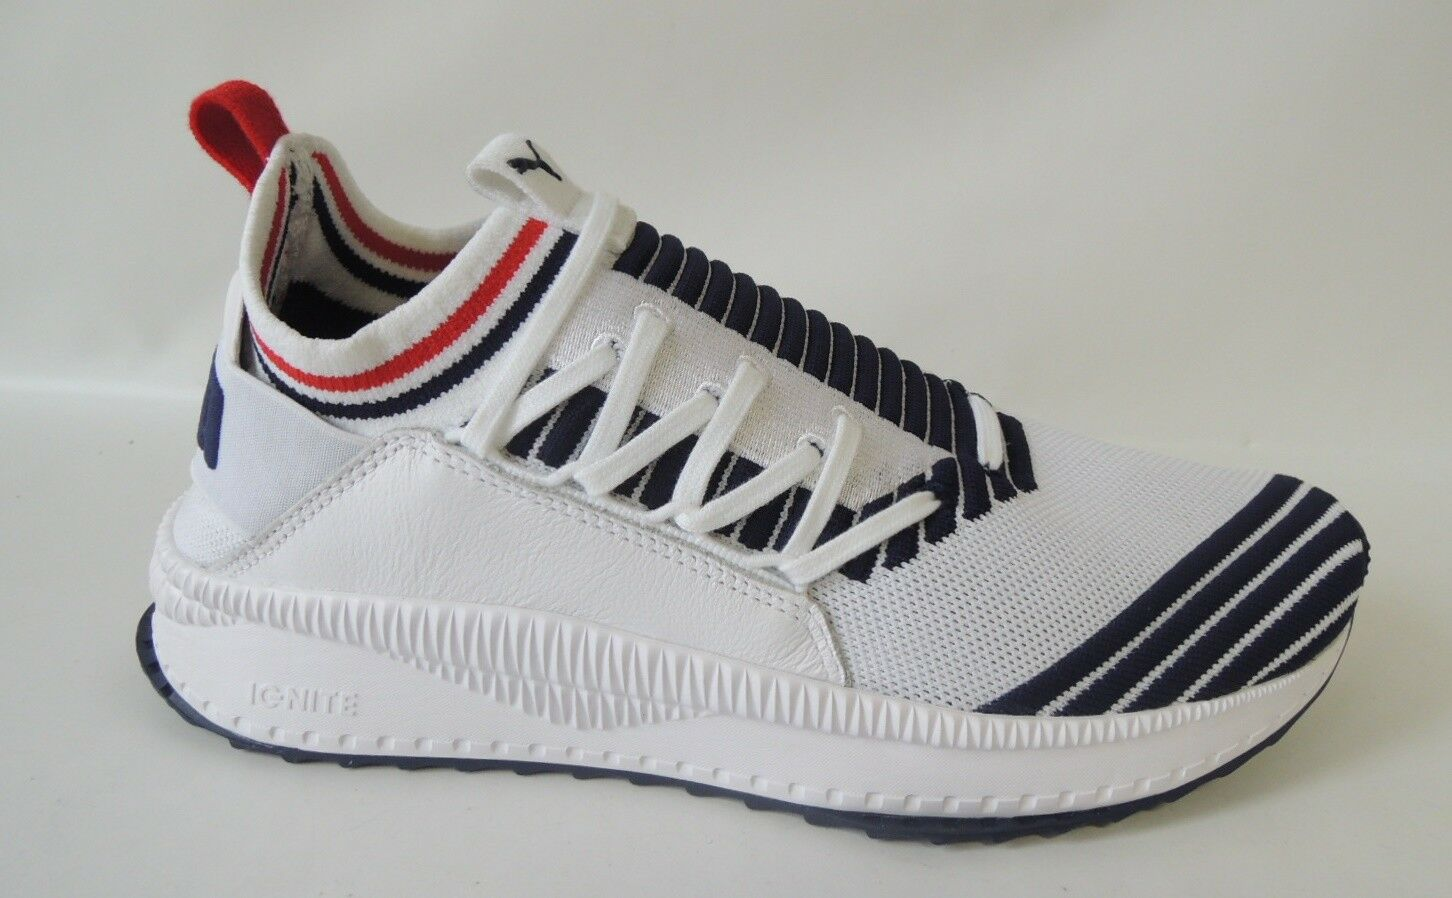 NEU Puma Ignite Tsugi Jun Sport Stripes Größe 46 Socken Turnschuhe 367519-01